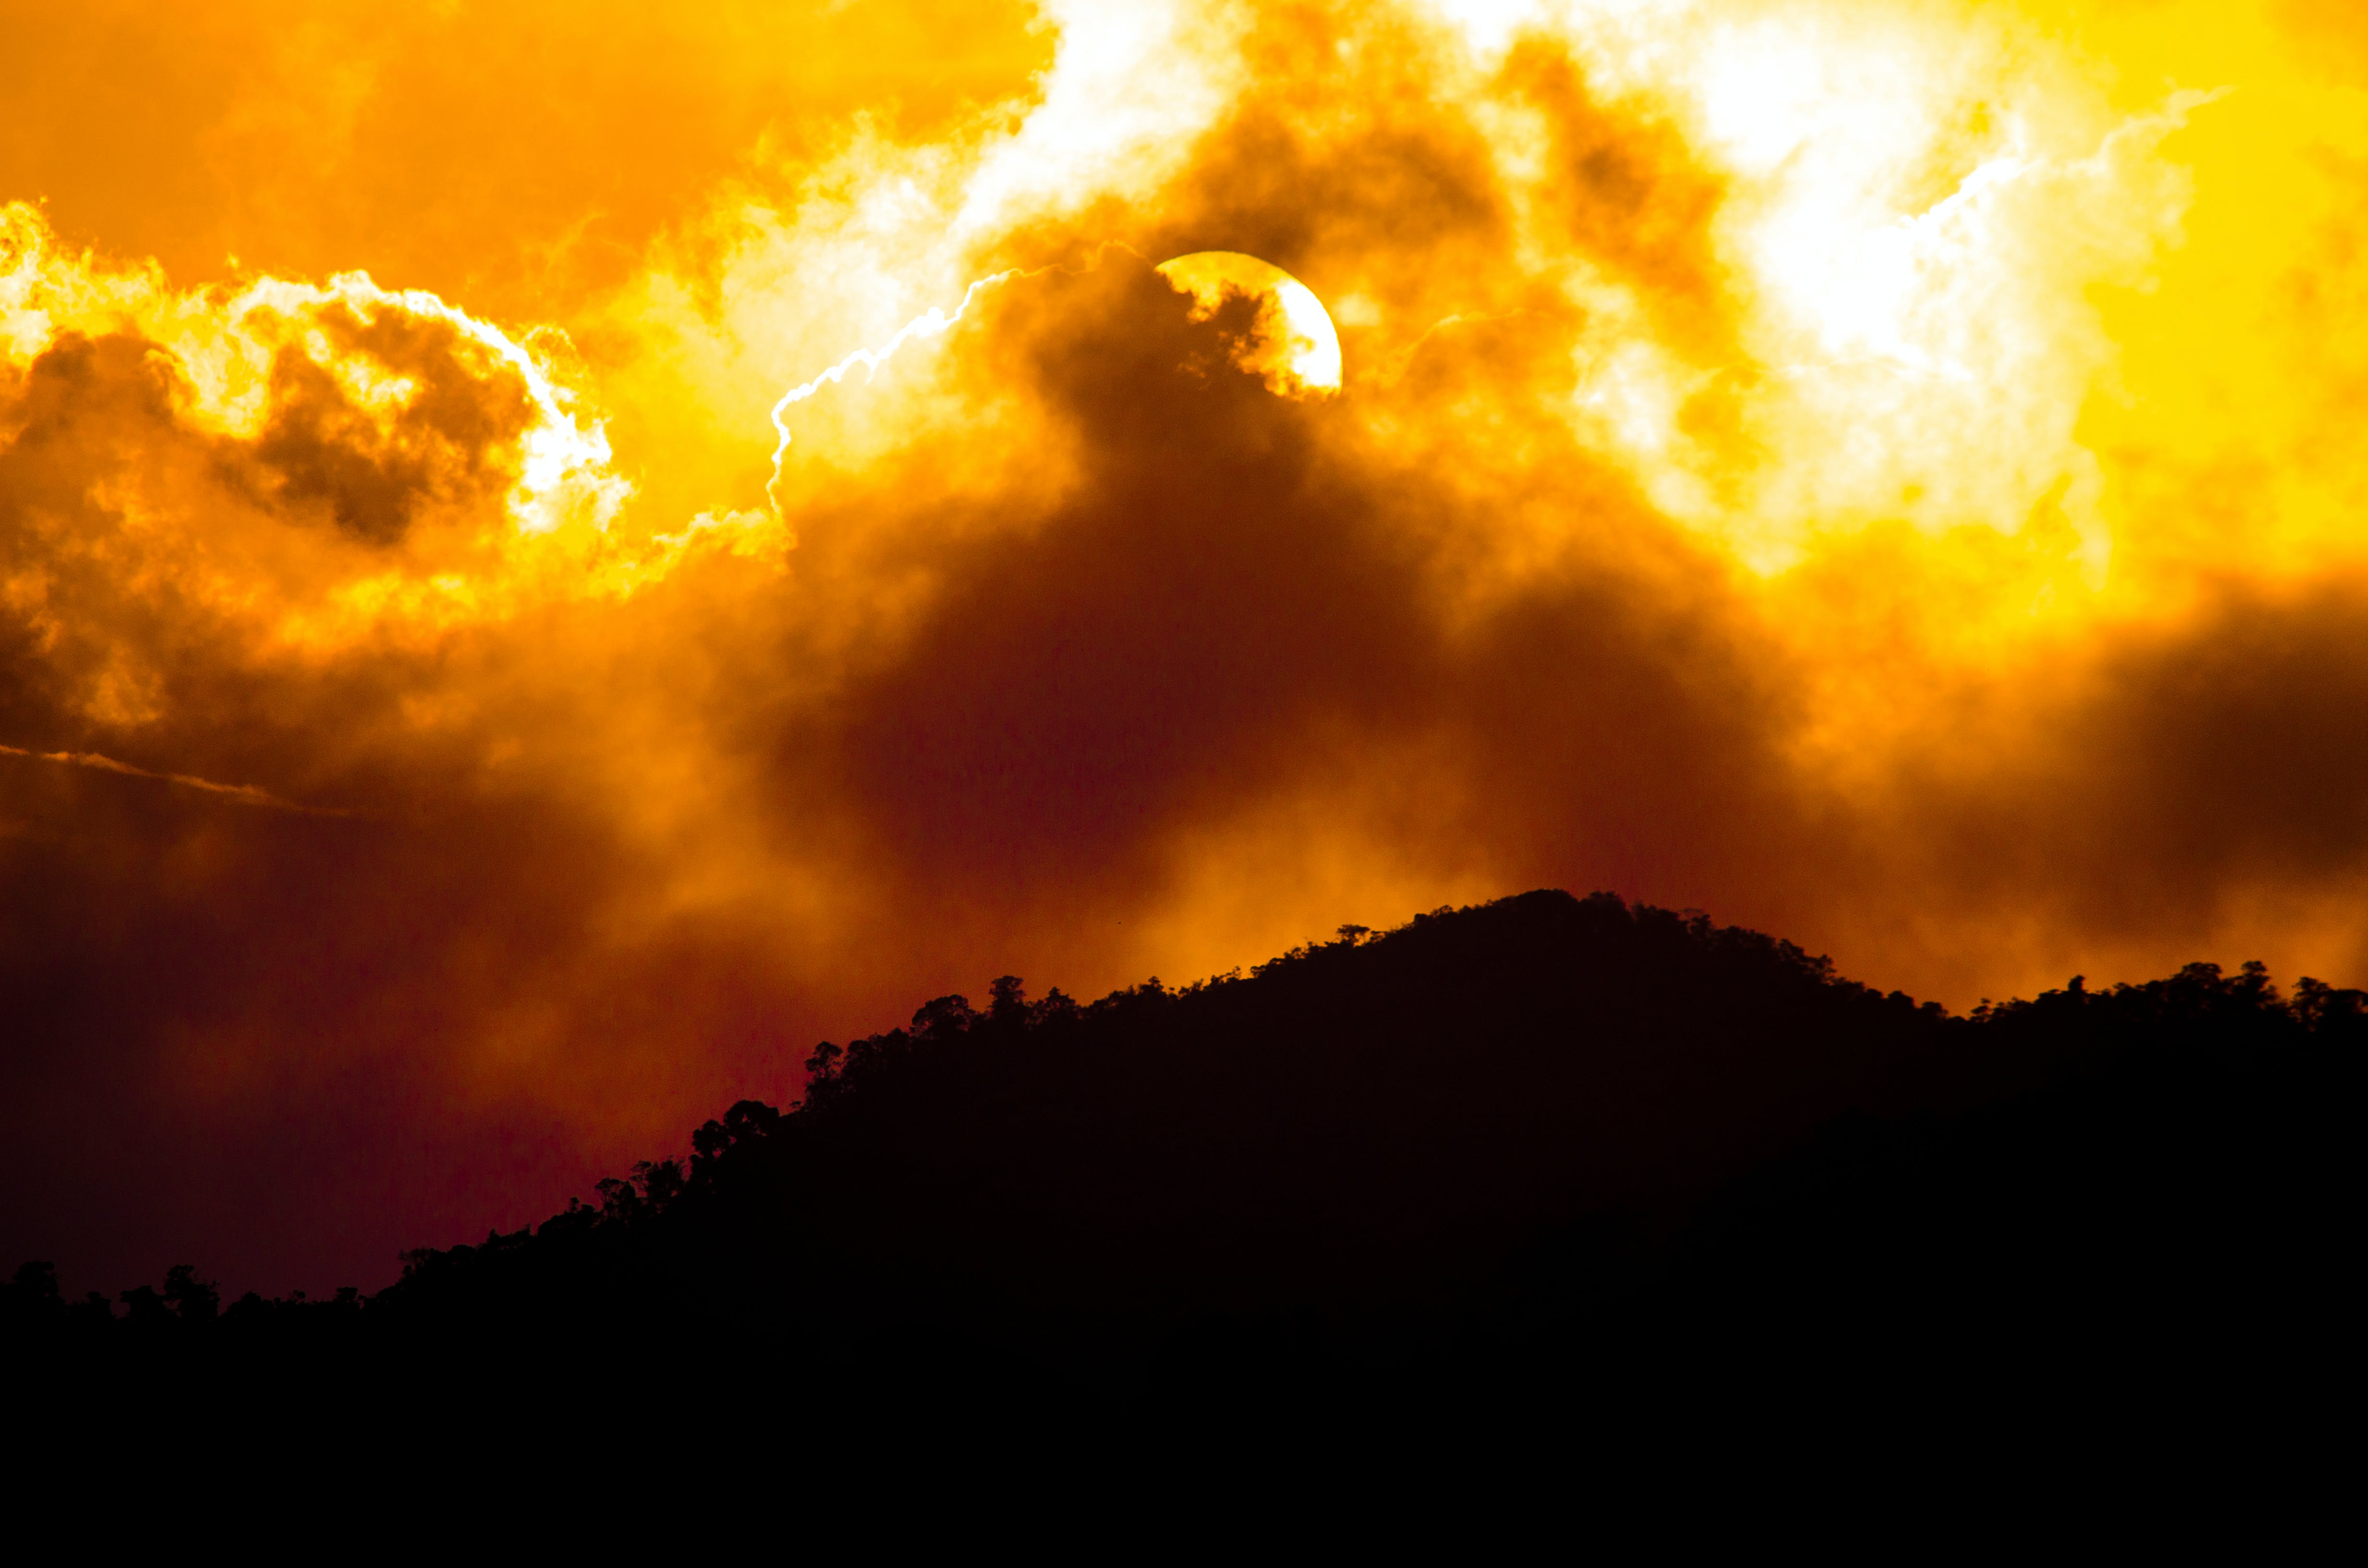 Free stock photo of Apocaliptic Sky, cloudy sky, golden sun, high contrast